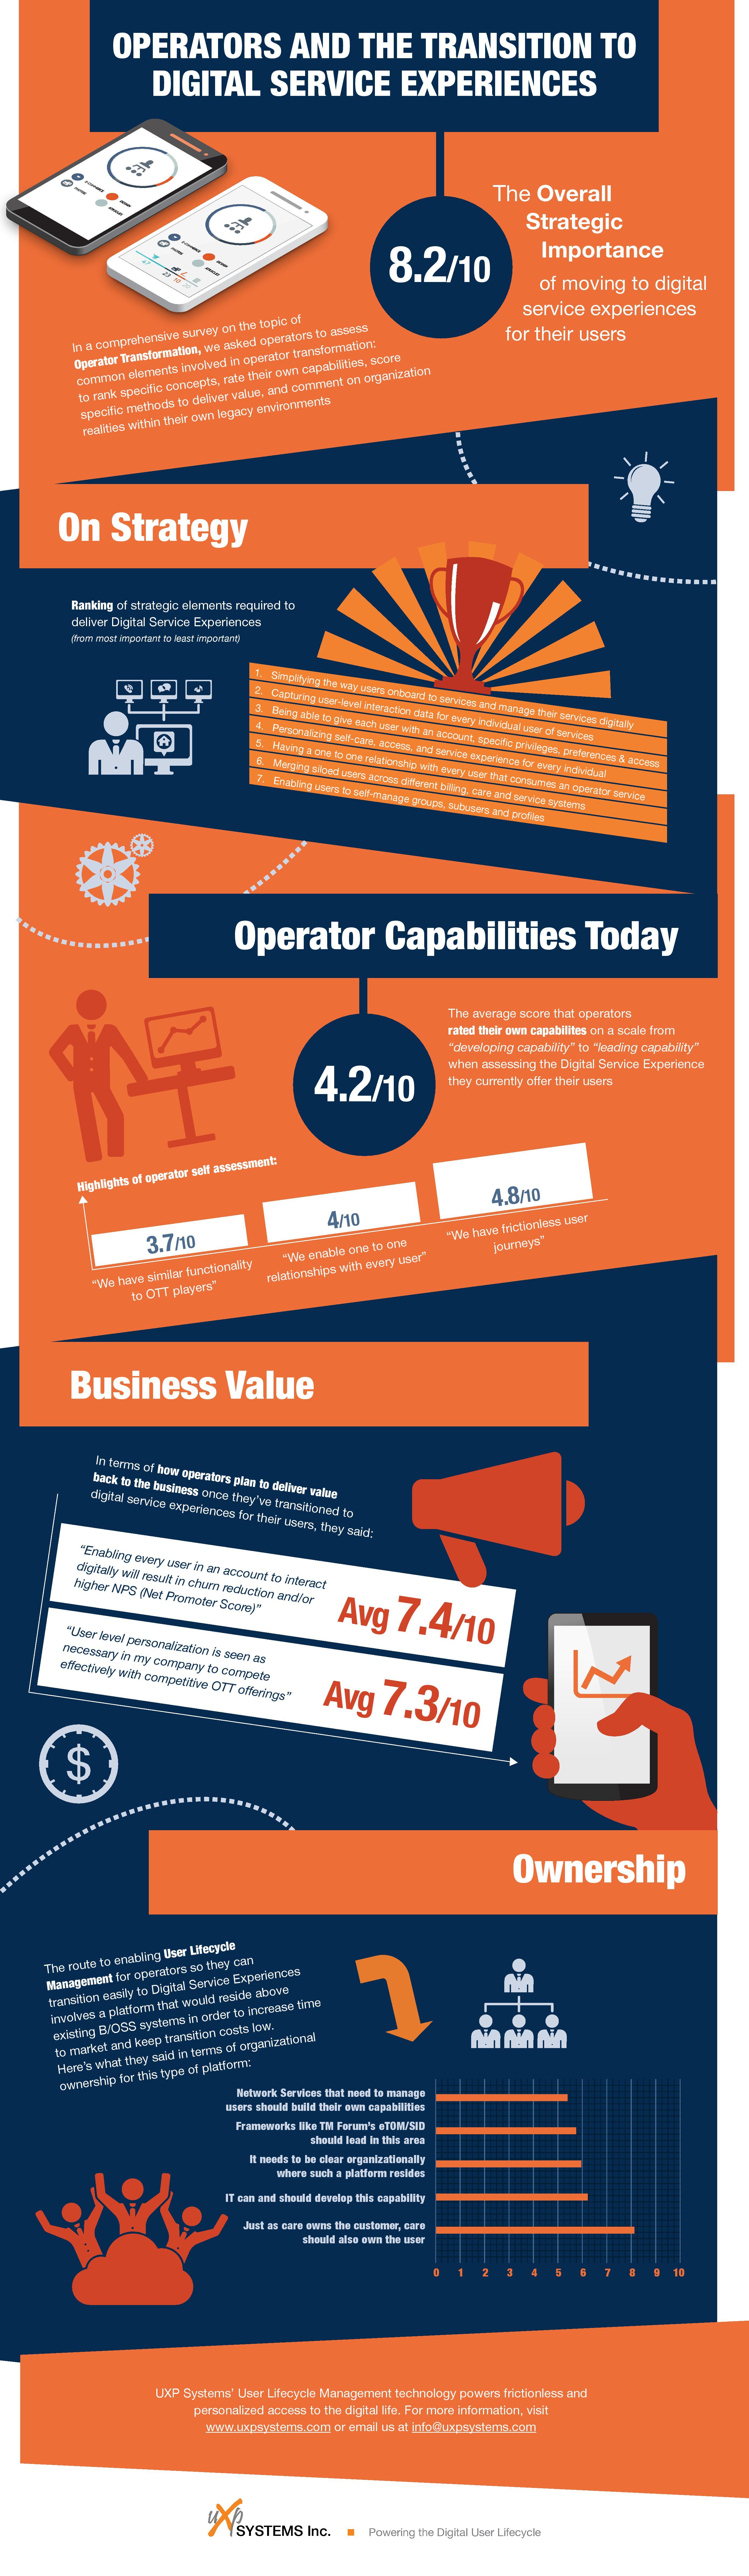 2016-02-18 Infographic Operators CEM Survey-page-001